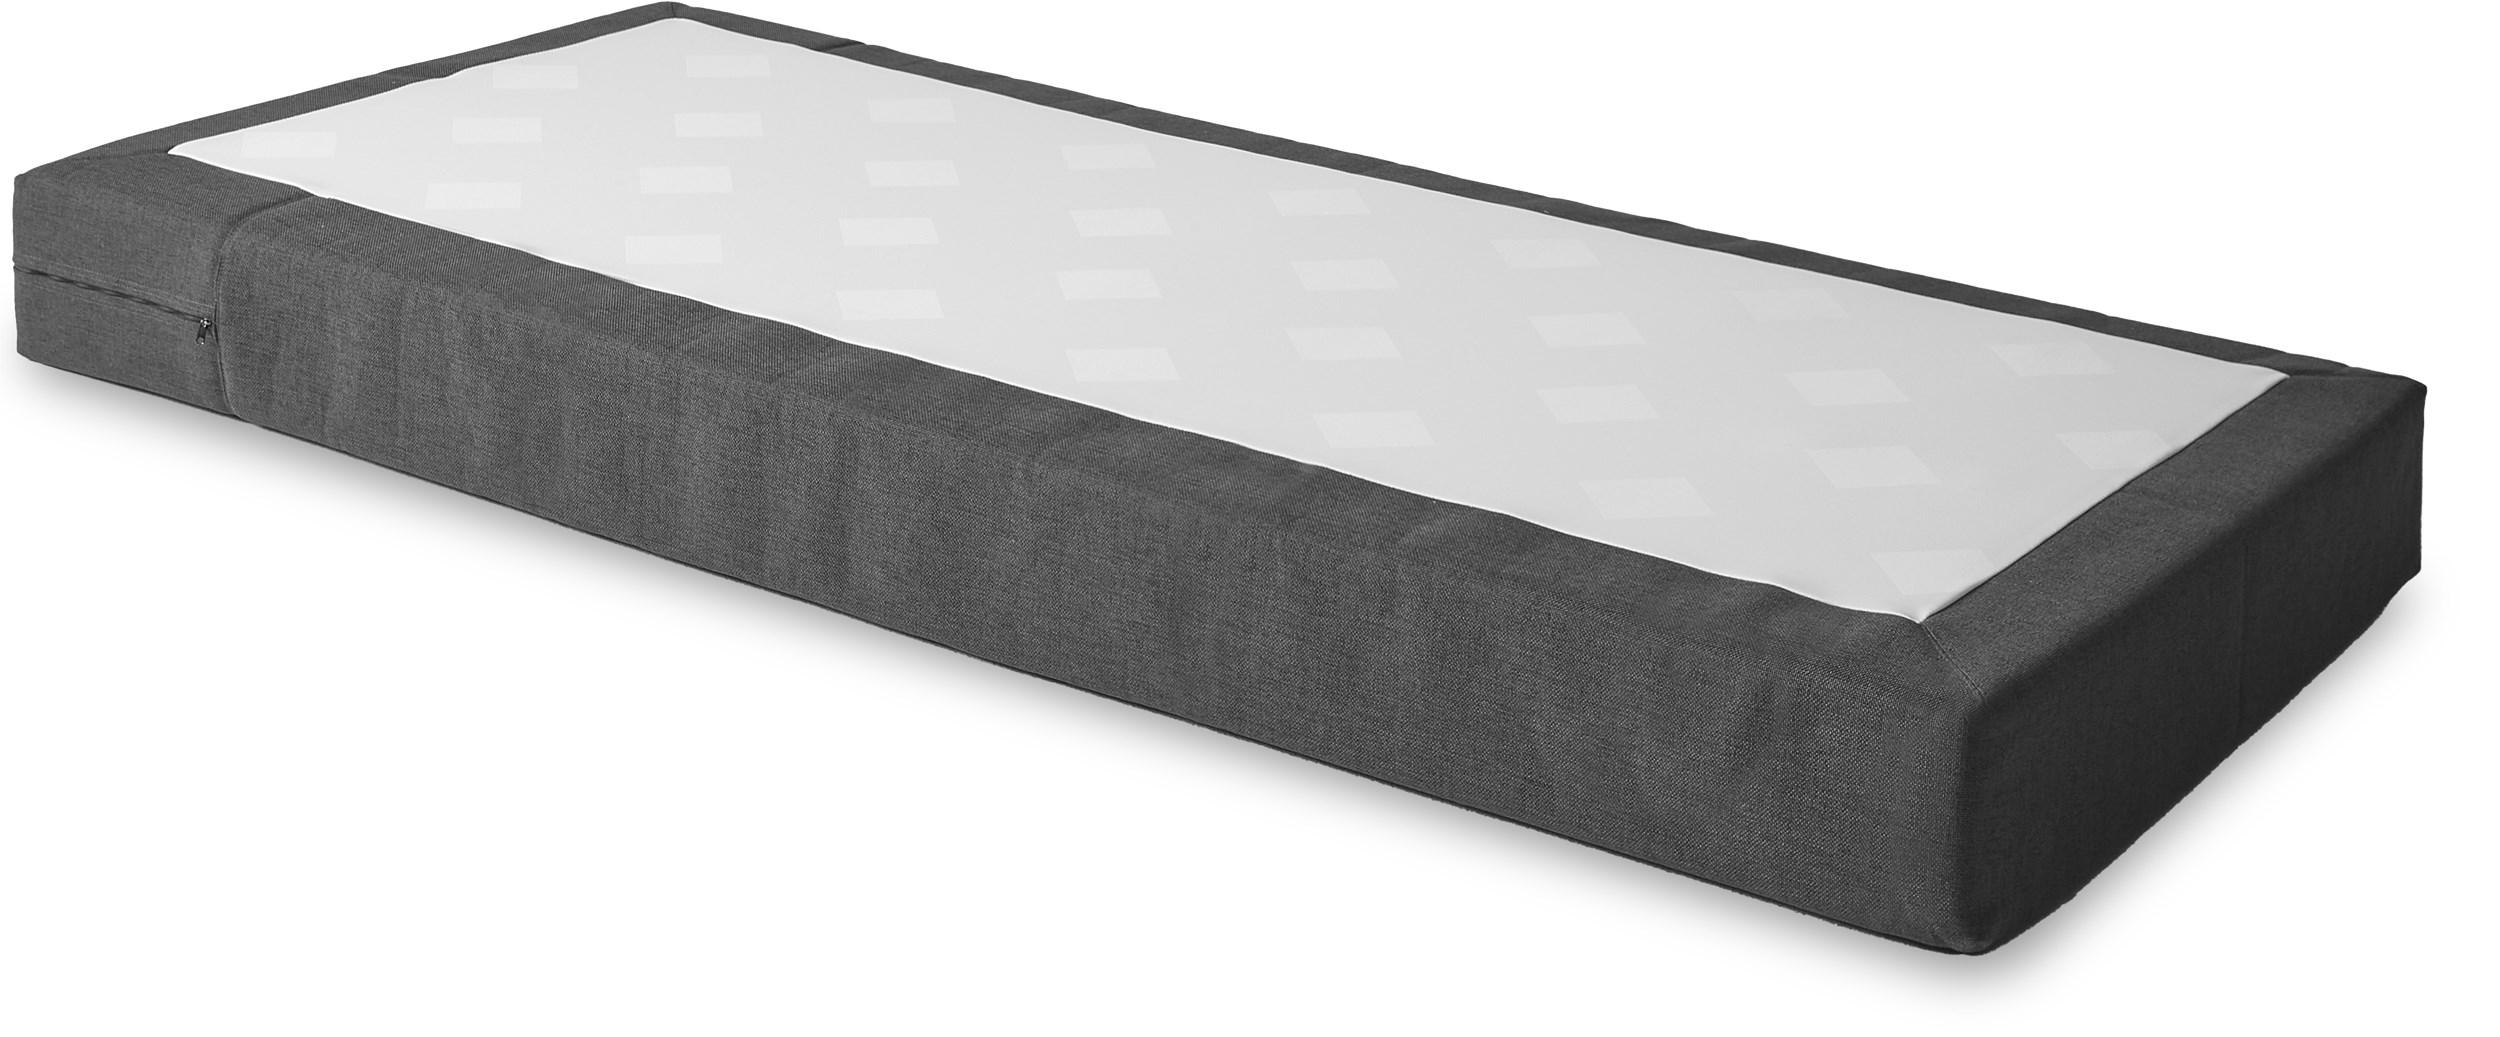 Nocturne Silver VB Elevationsmadras 90 x 200 x 21 cm